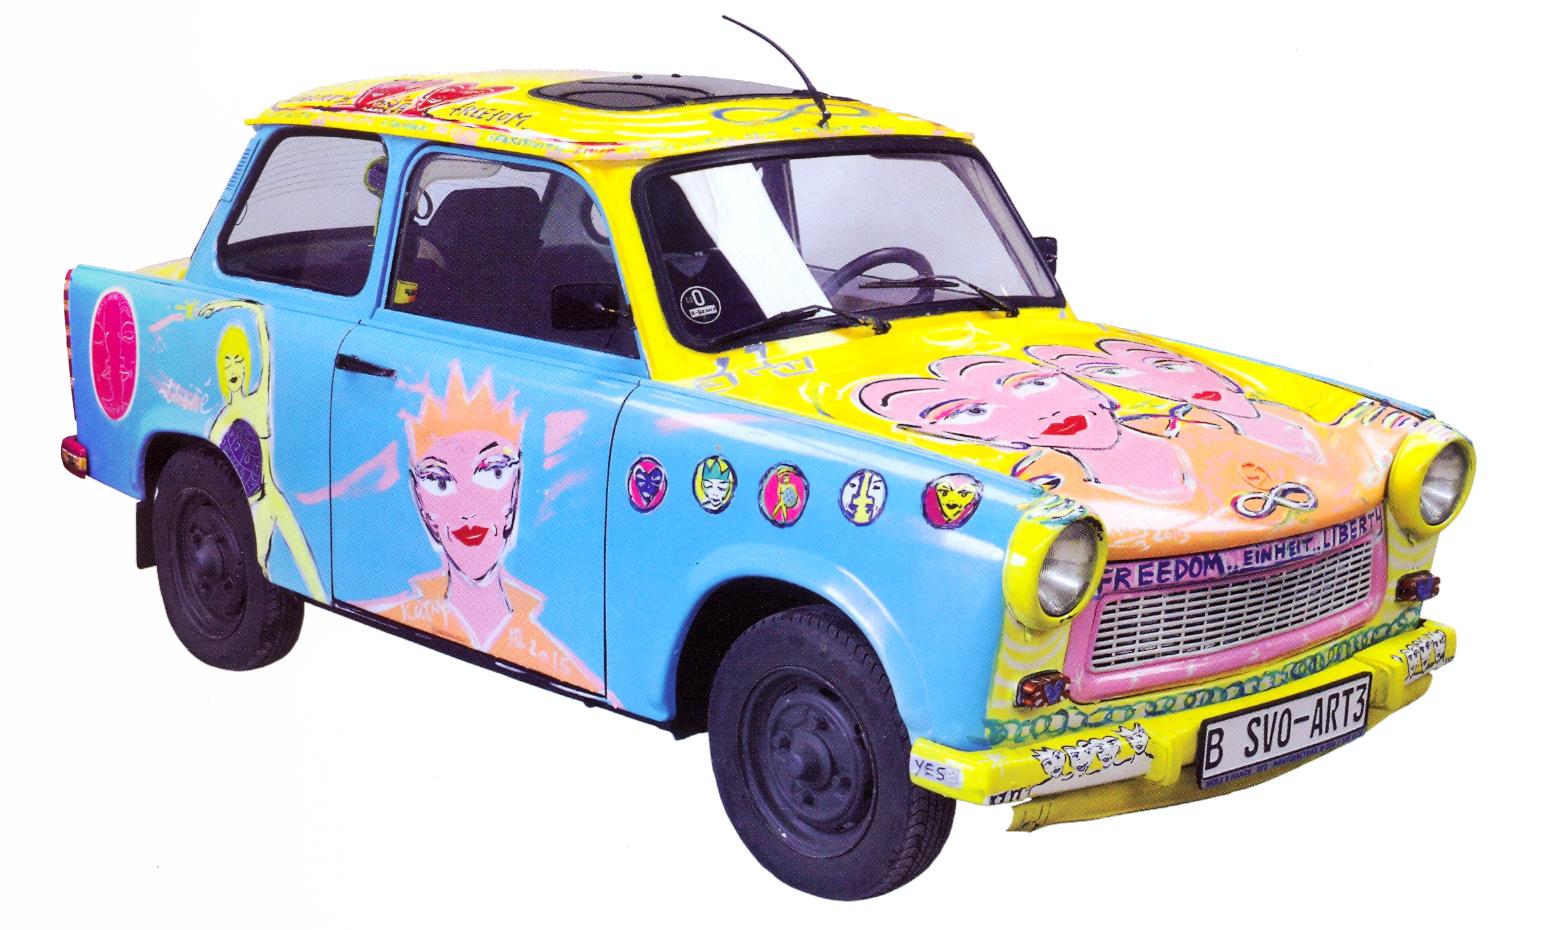 Trabant, 2014, collection sVo Art France